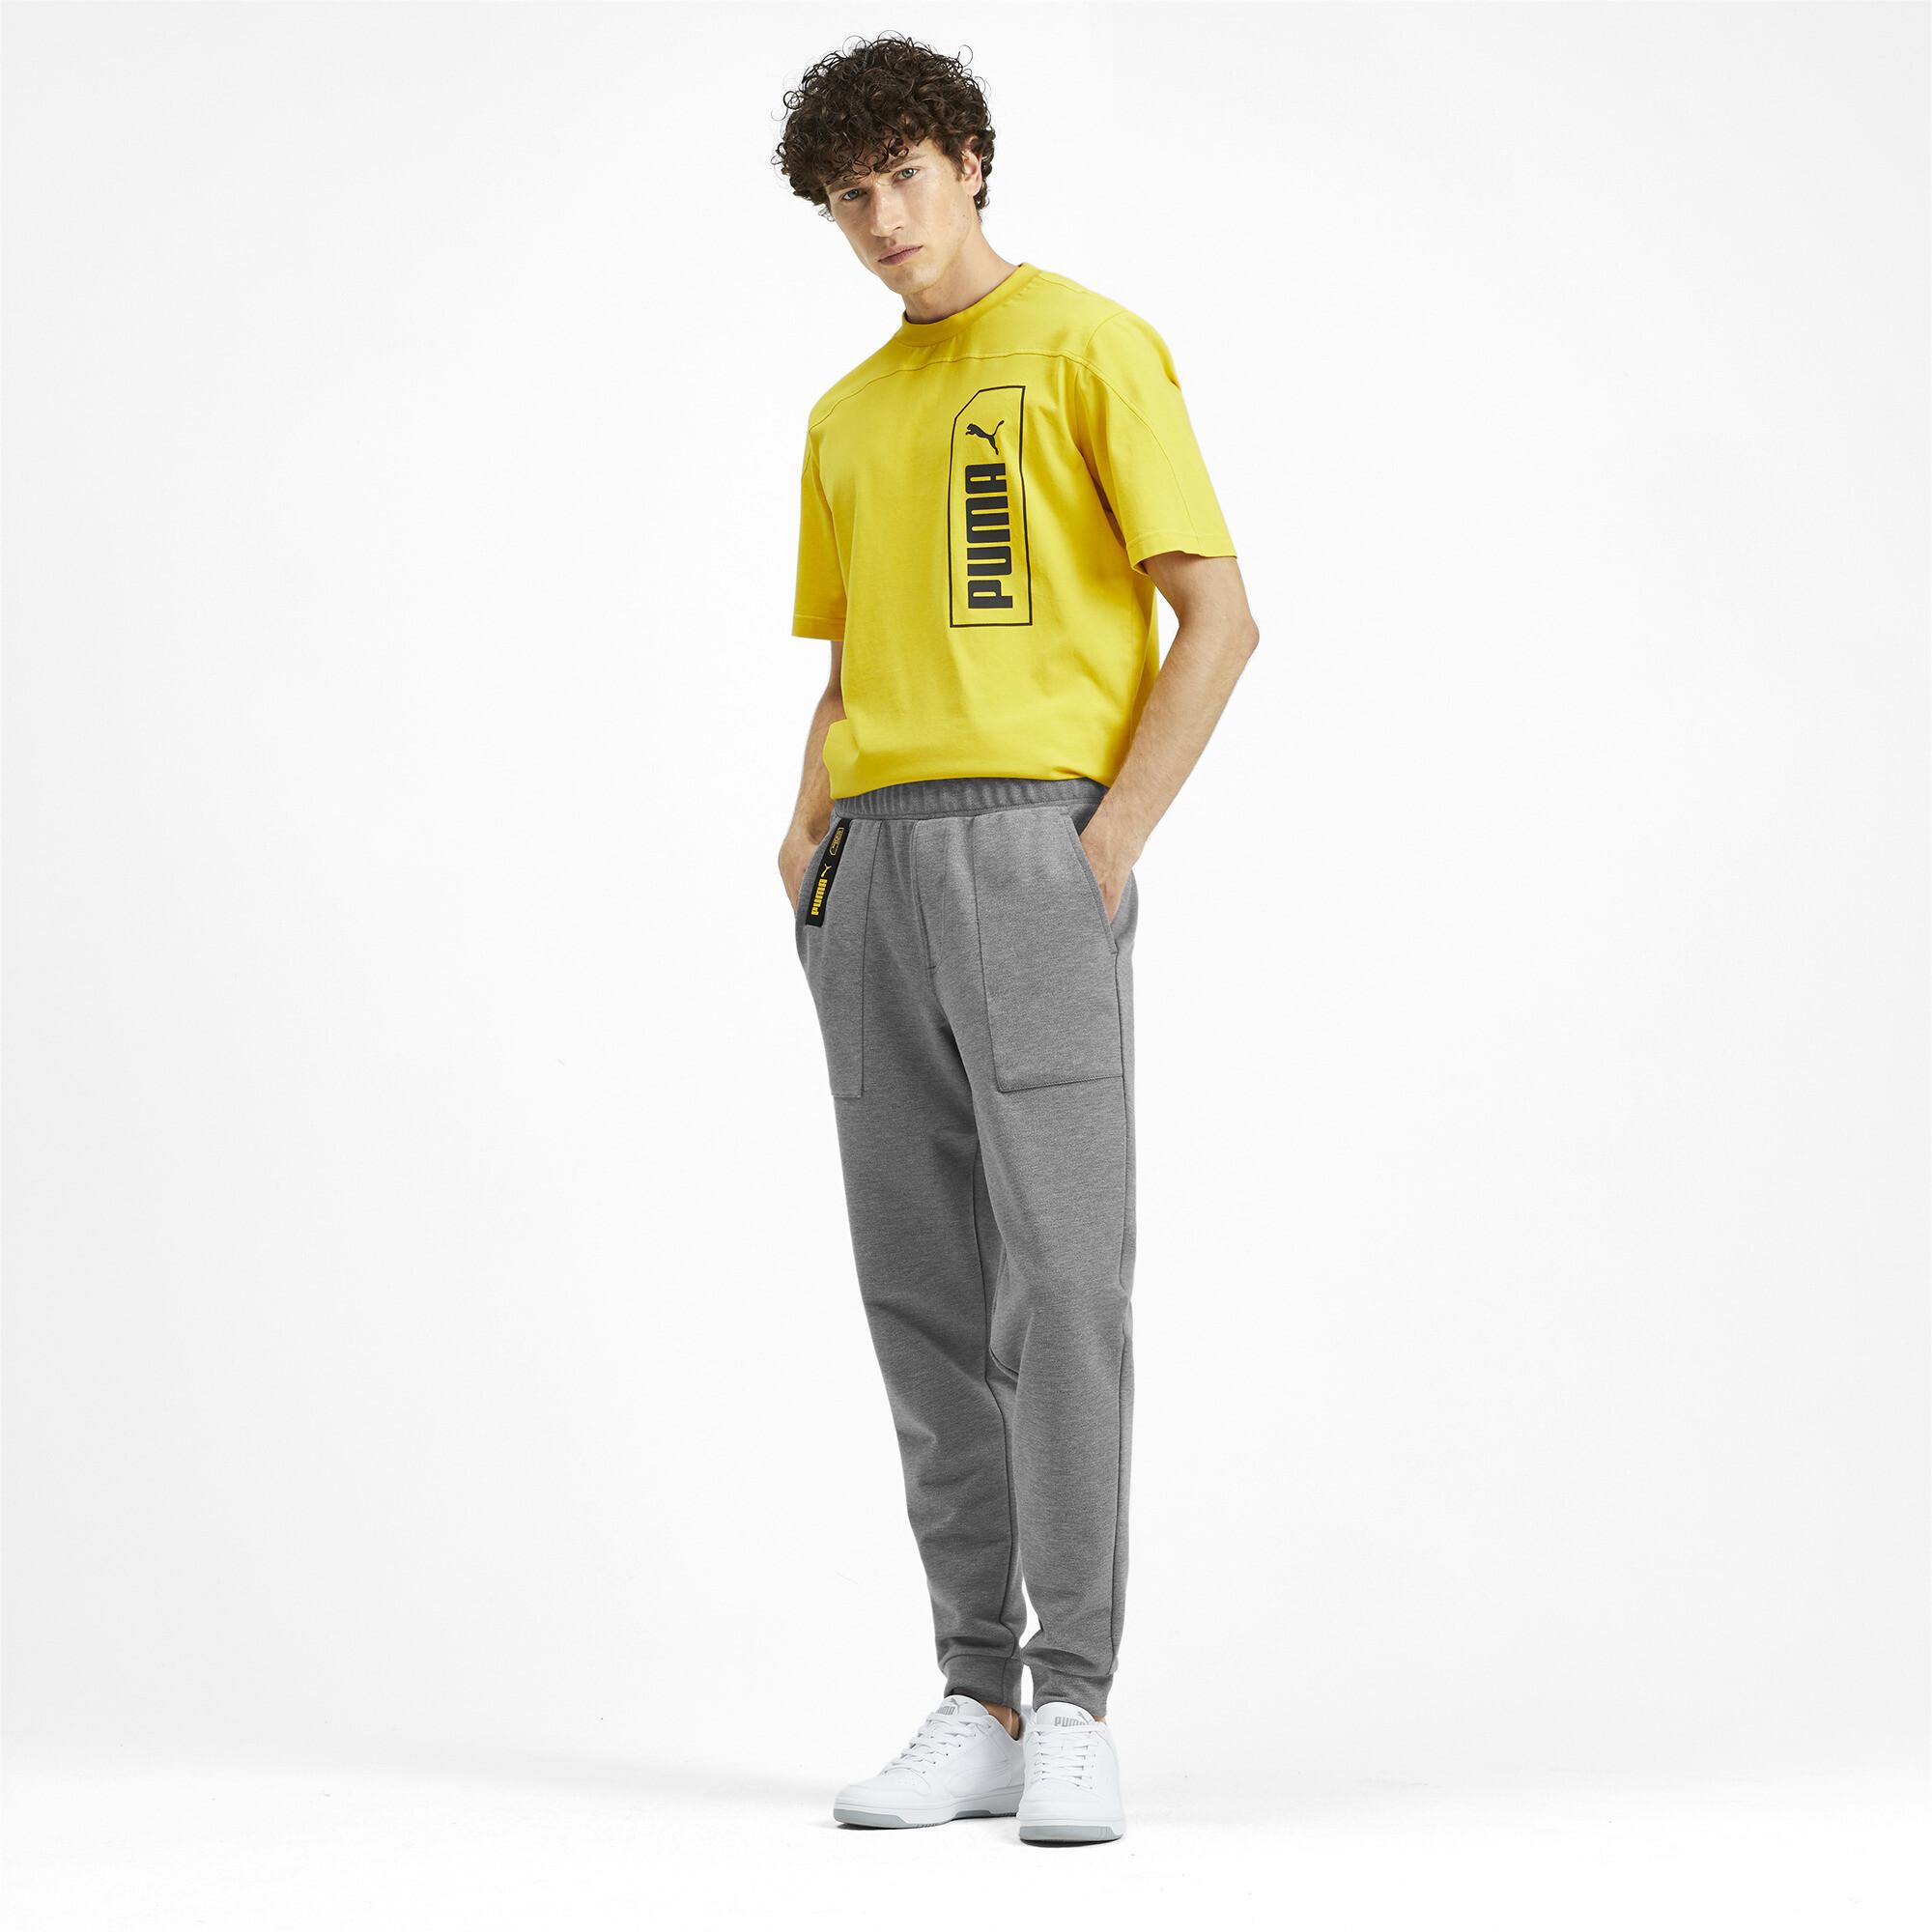 PUMA-NU-TILITY-Men-039-s-Sweatpants-Men-Knitted-Pants-Basics thumbnail 6